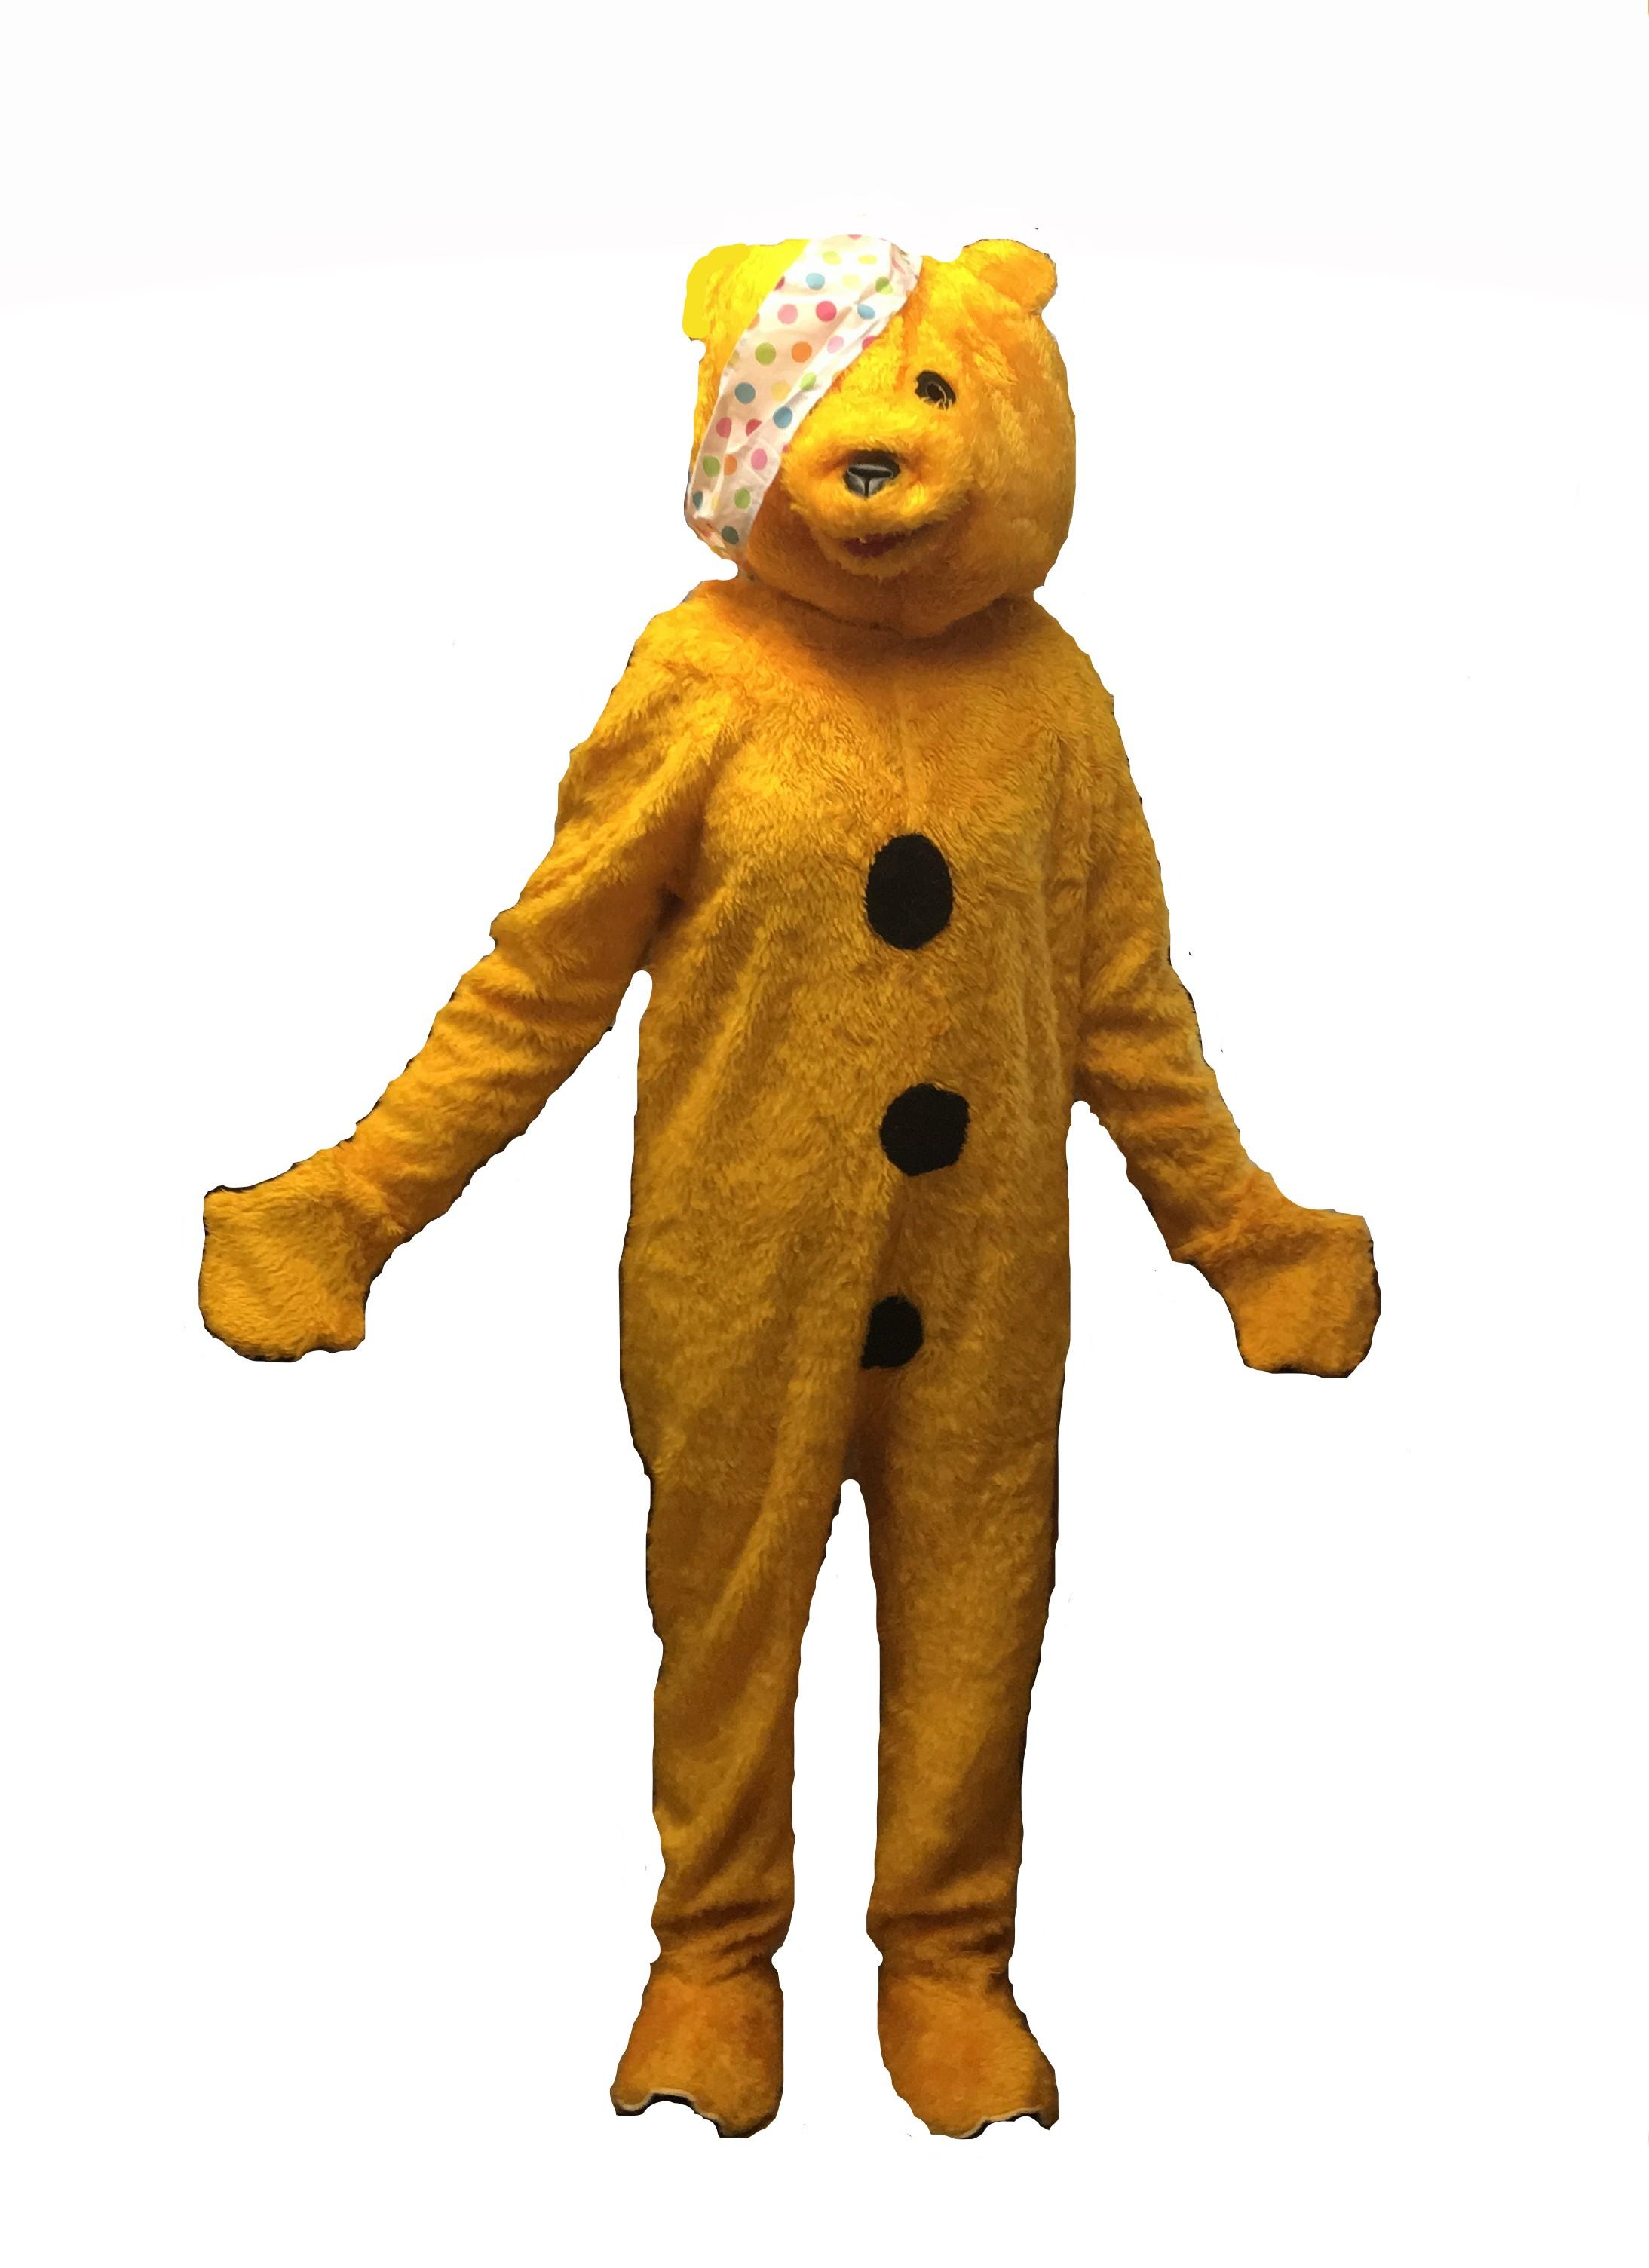 children in need costume